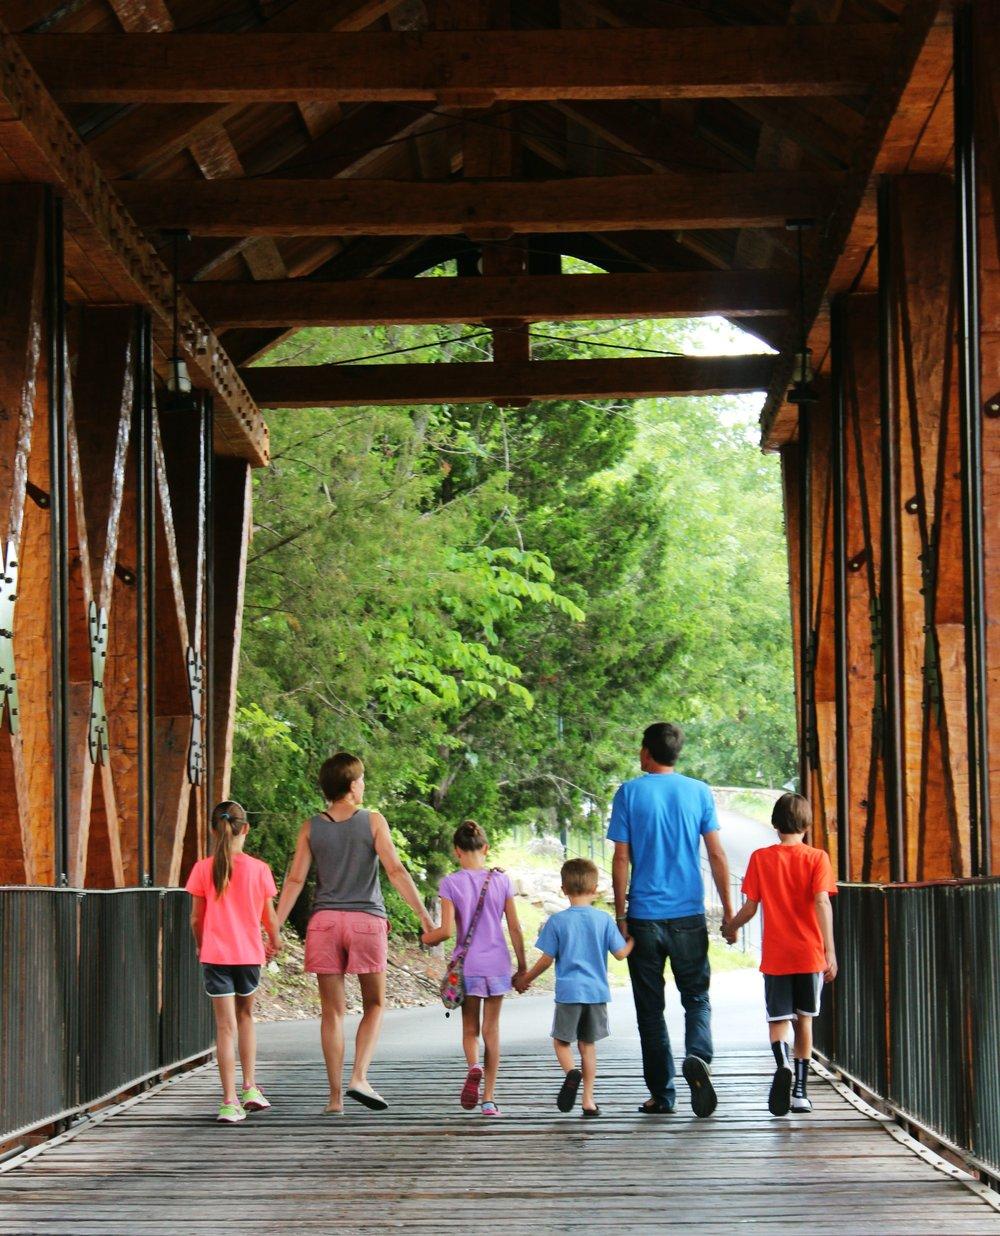 big-cedar-amish-bridge-devils-pool-family-vacation